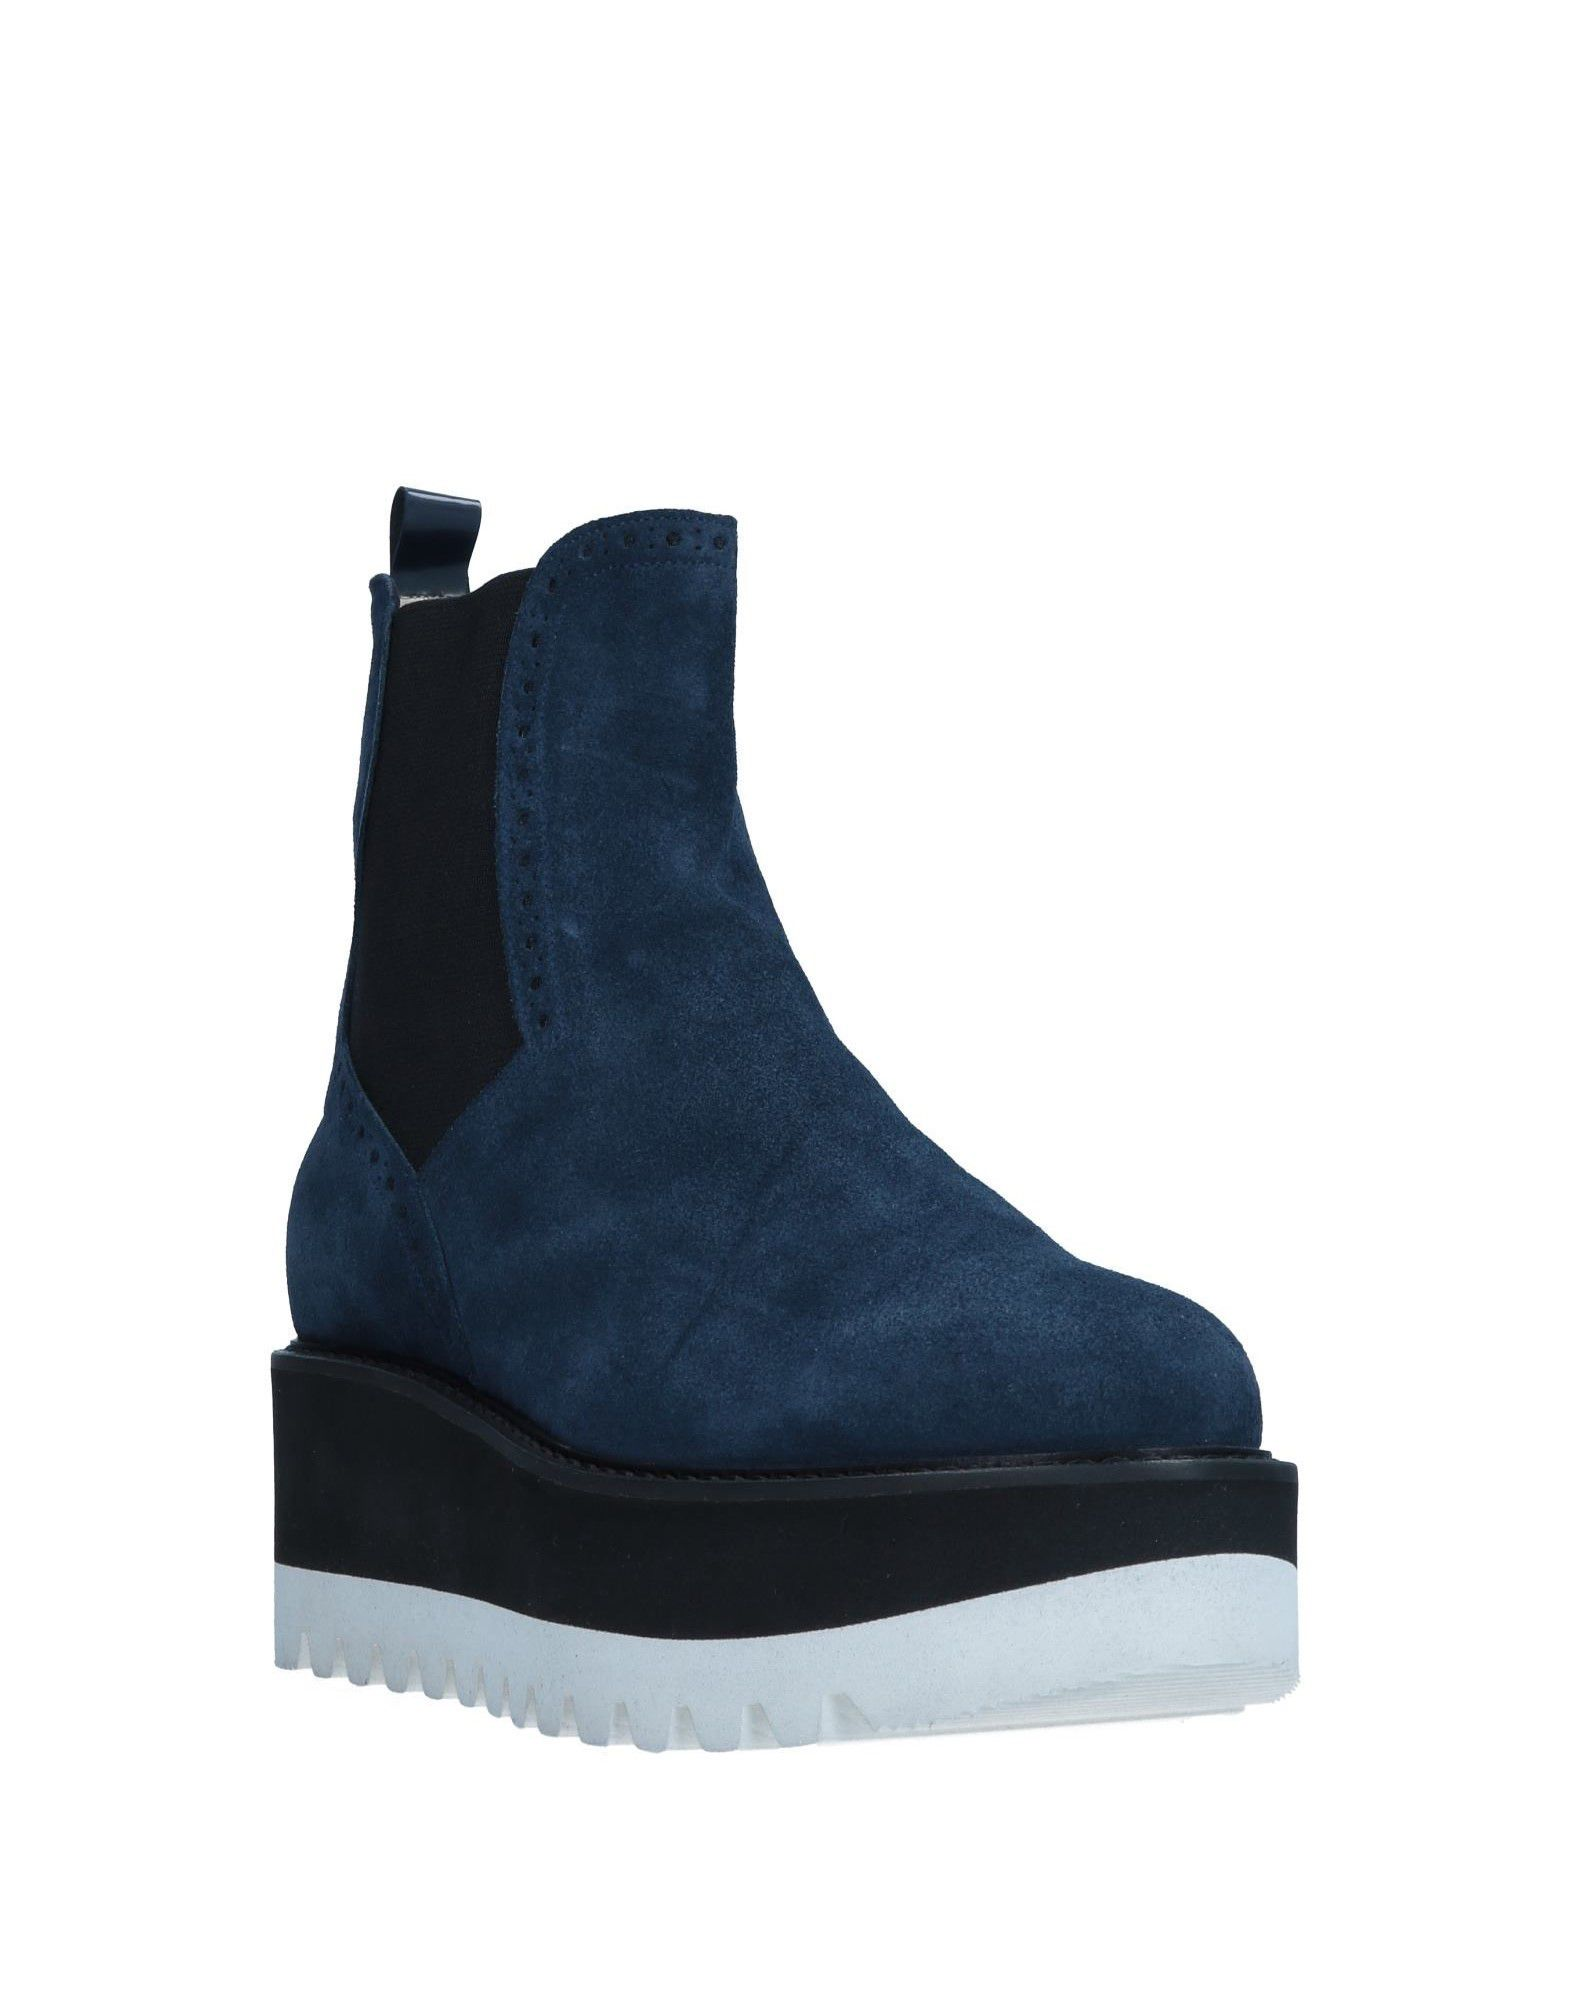 La Gutes Blanc Chelsea Boots Damen Gutes La Preis-Leistungs-Verhältnis, es lohnt sich,Sonderangebot-3653 405ea1